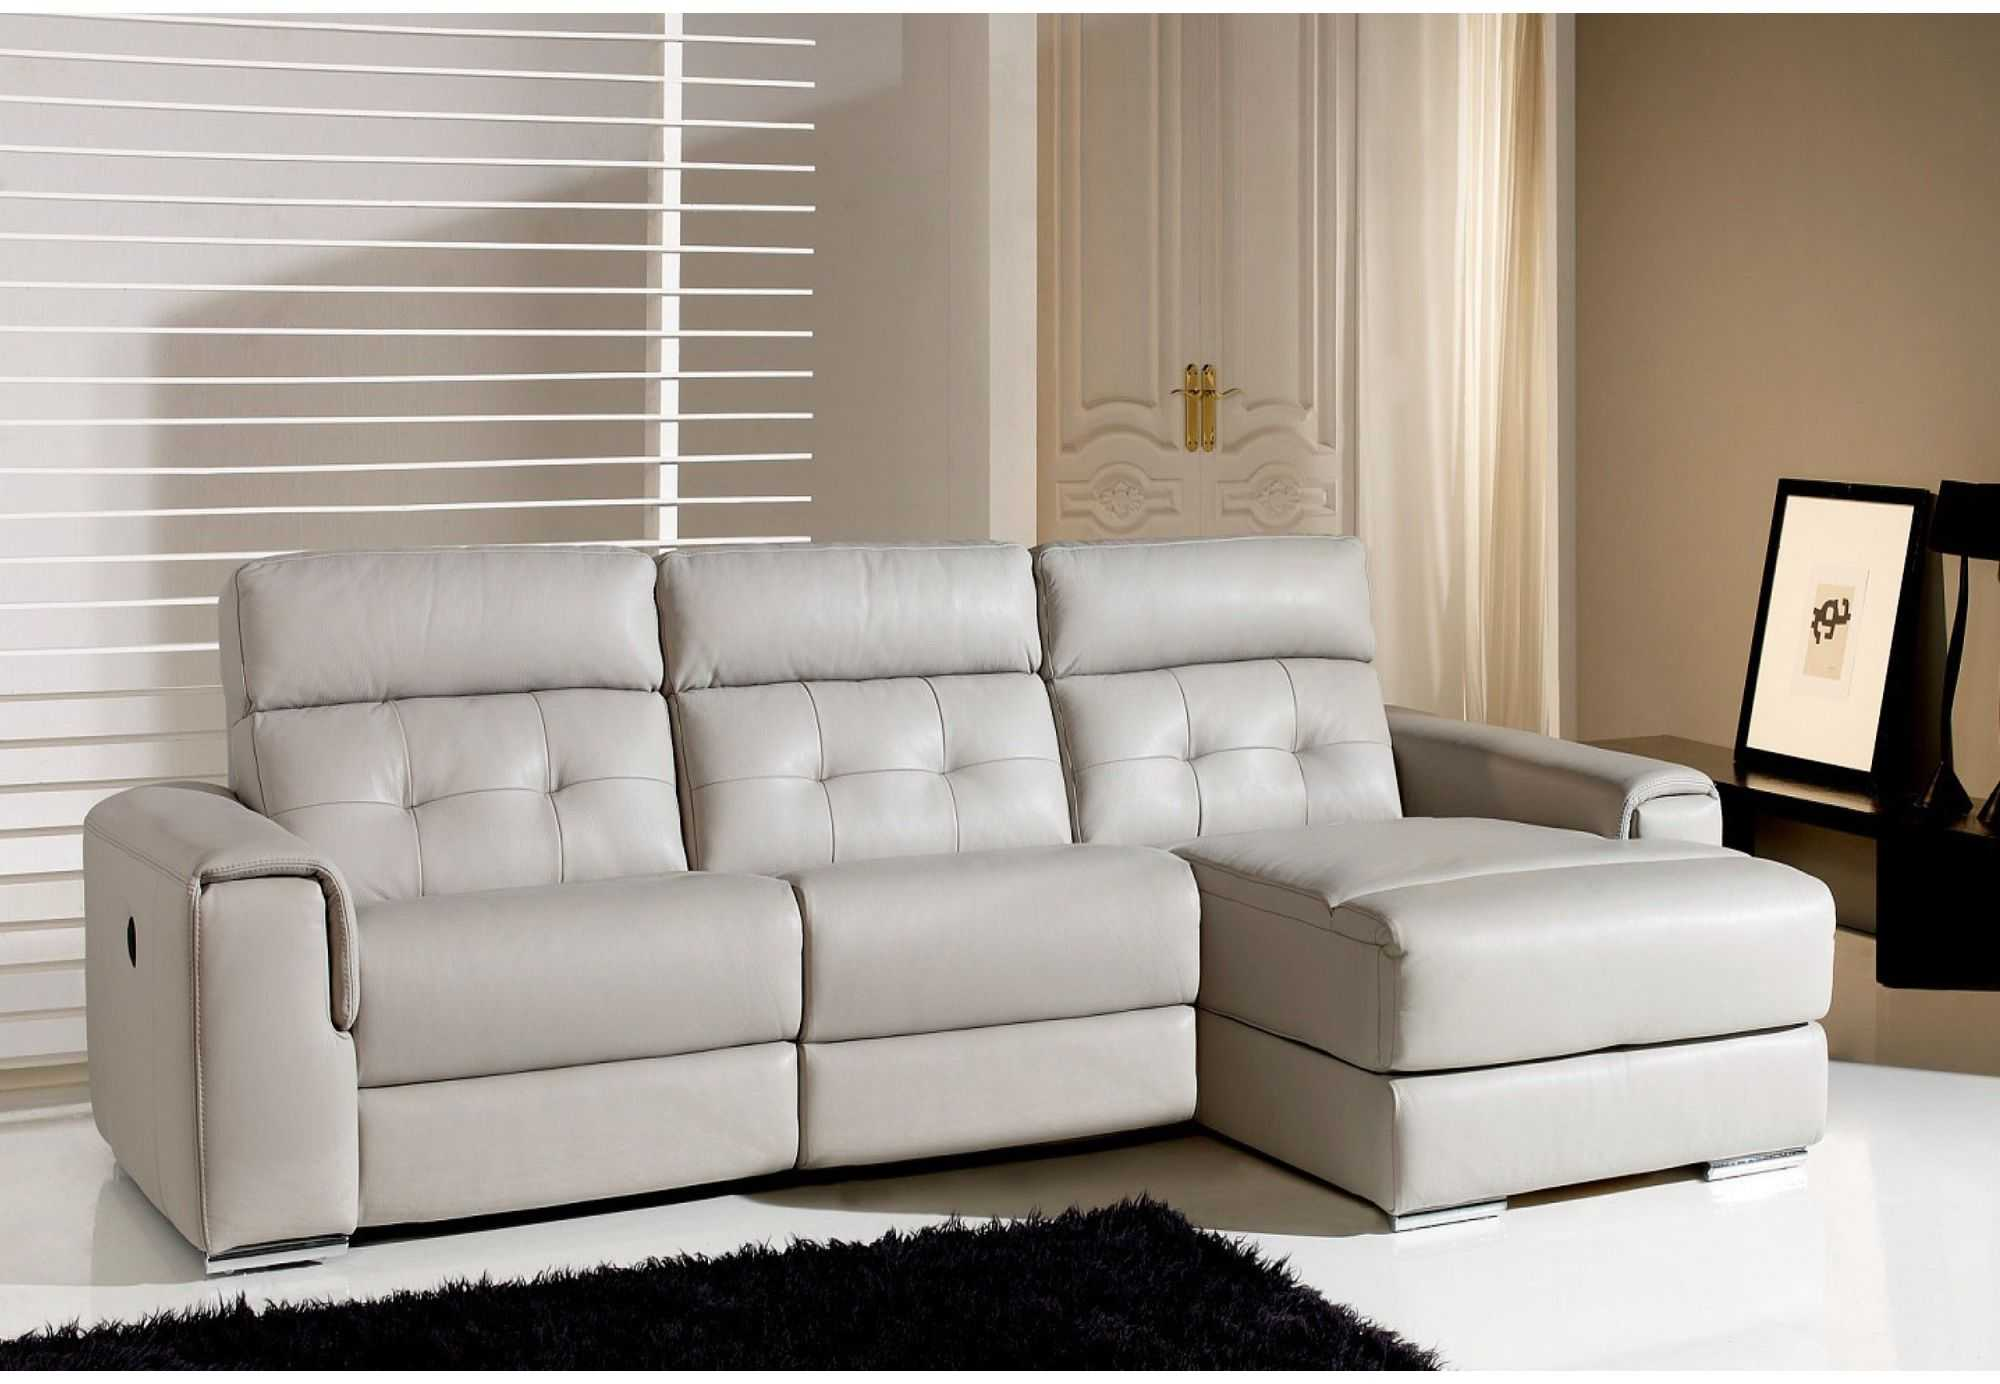 detroit chaiselongue relax el ctrico. Black Bedroom Furniture Sets. Home Design Ideas